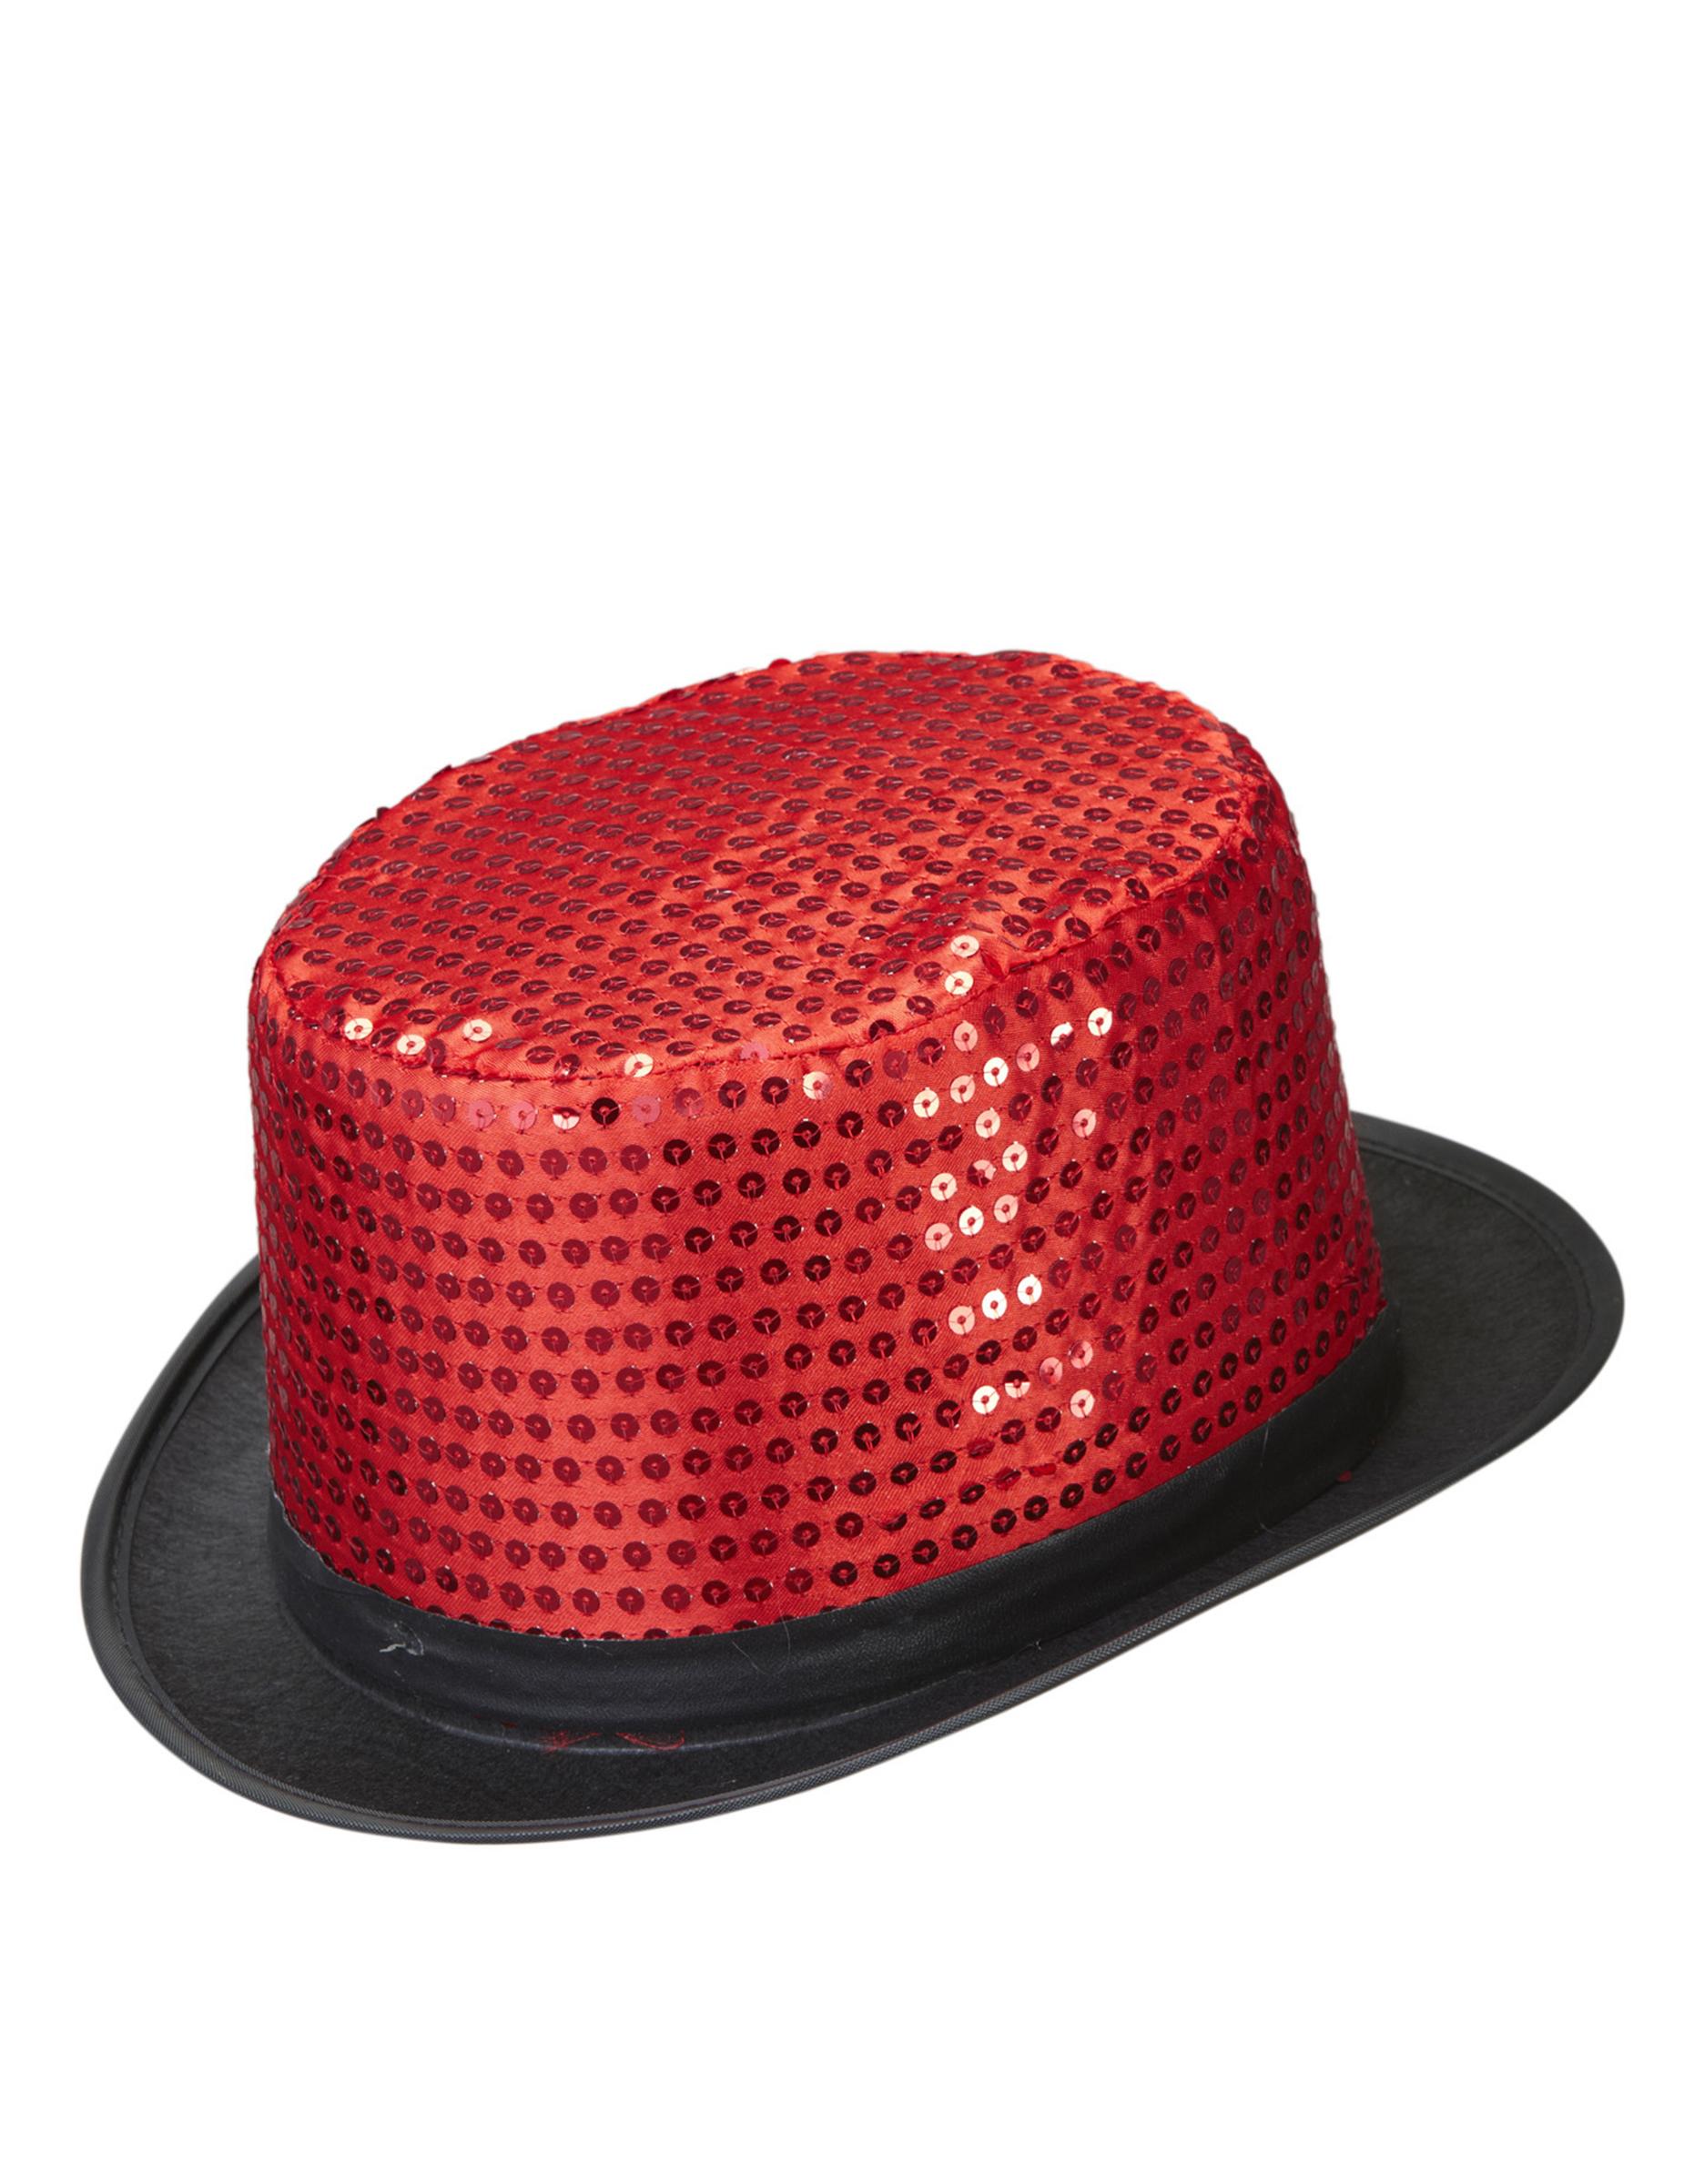 Pailletten Zylinder Party Hut Rot Gunstige Faschings Accessoires